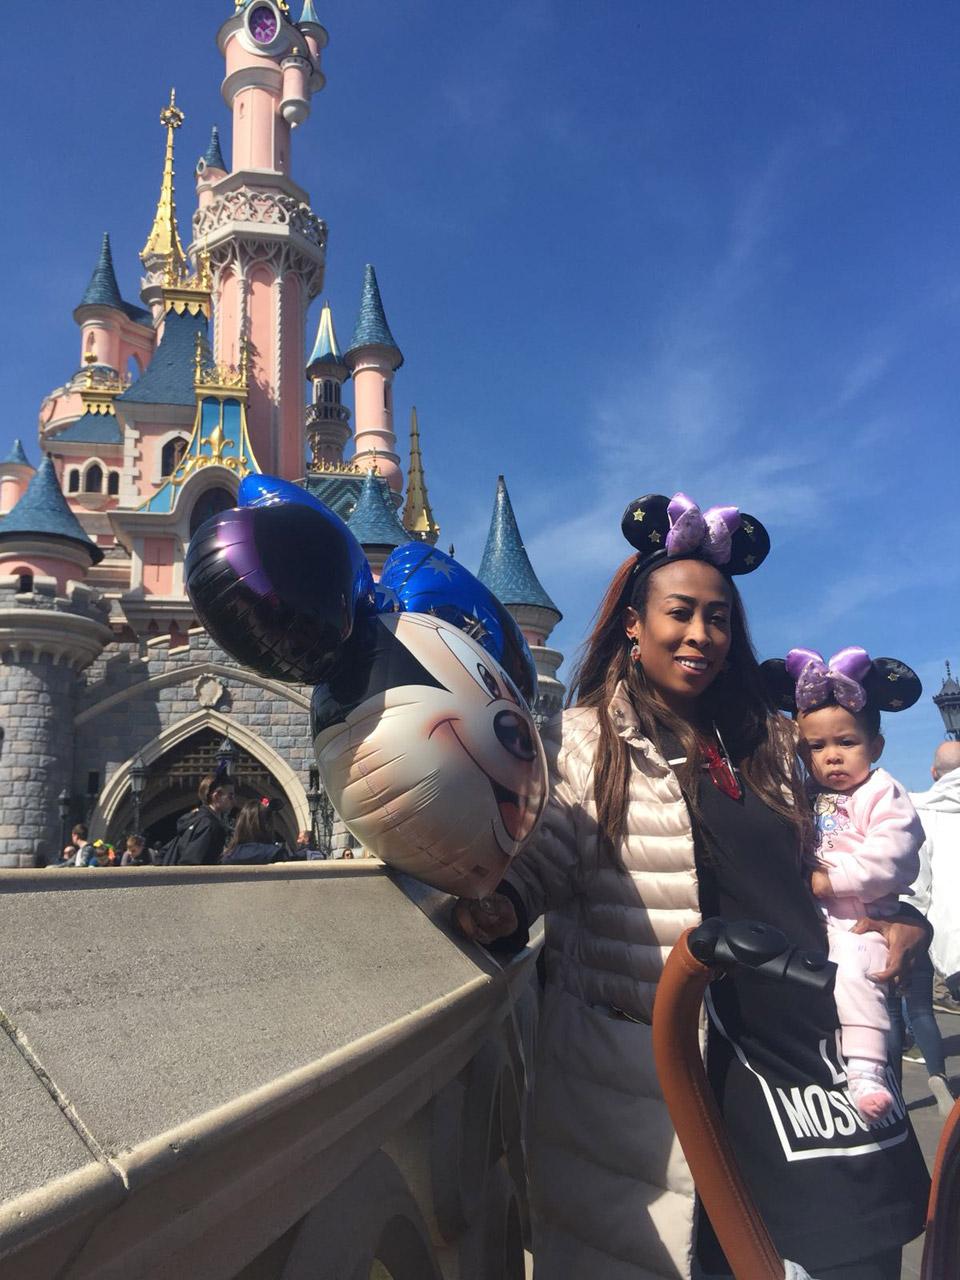 DisneyLand Paris – A must have experience